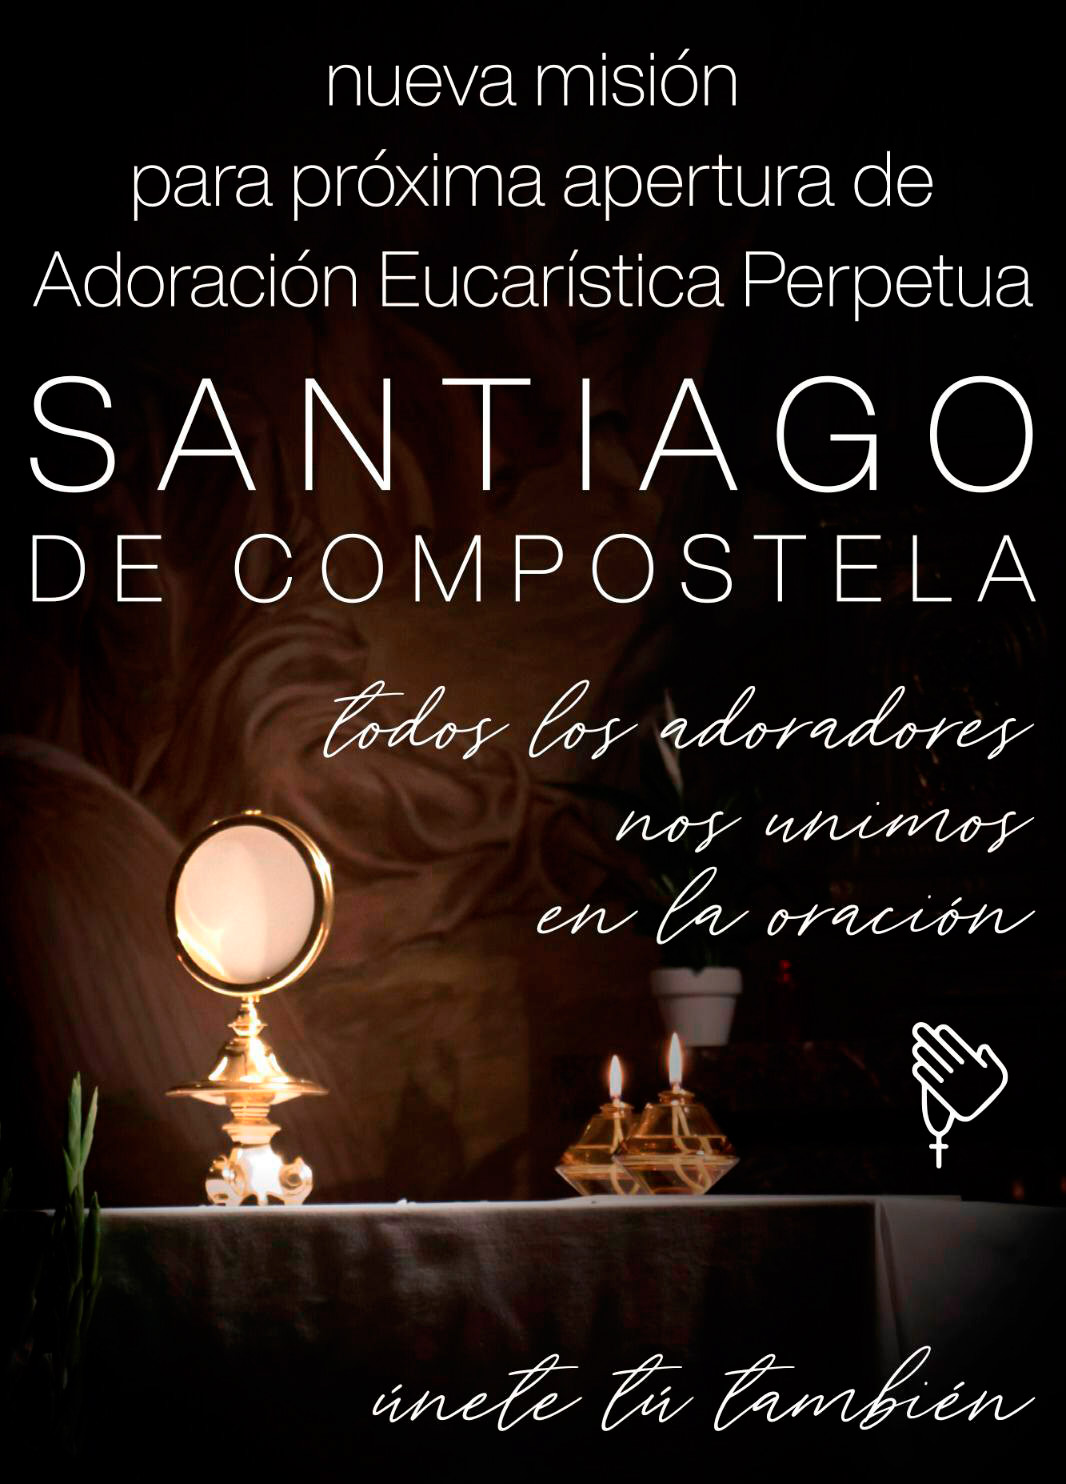 Nueva  Adoración Eucarística Santiago de Compostela